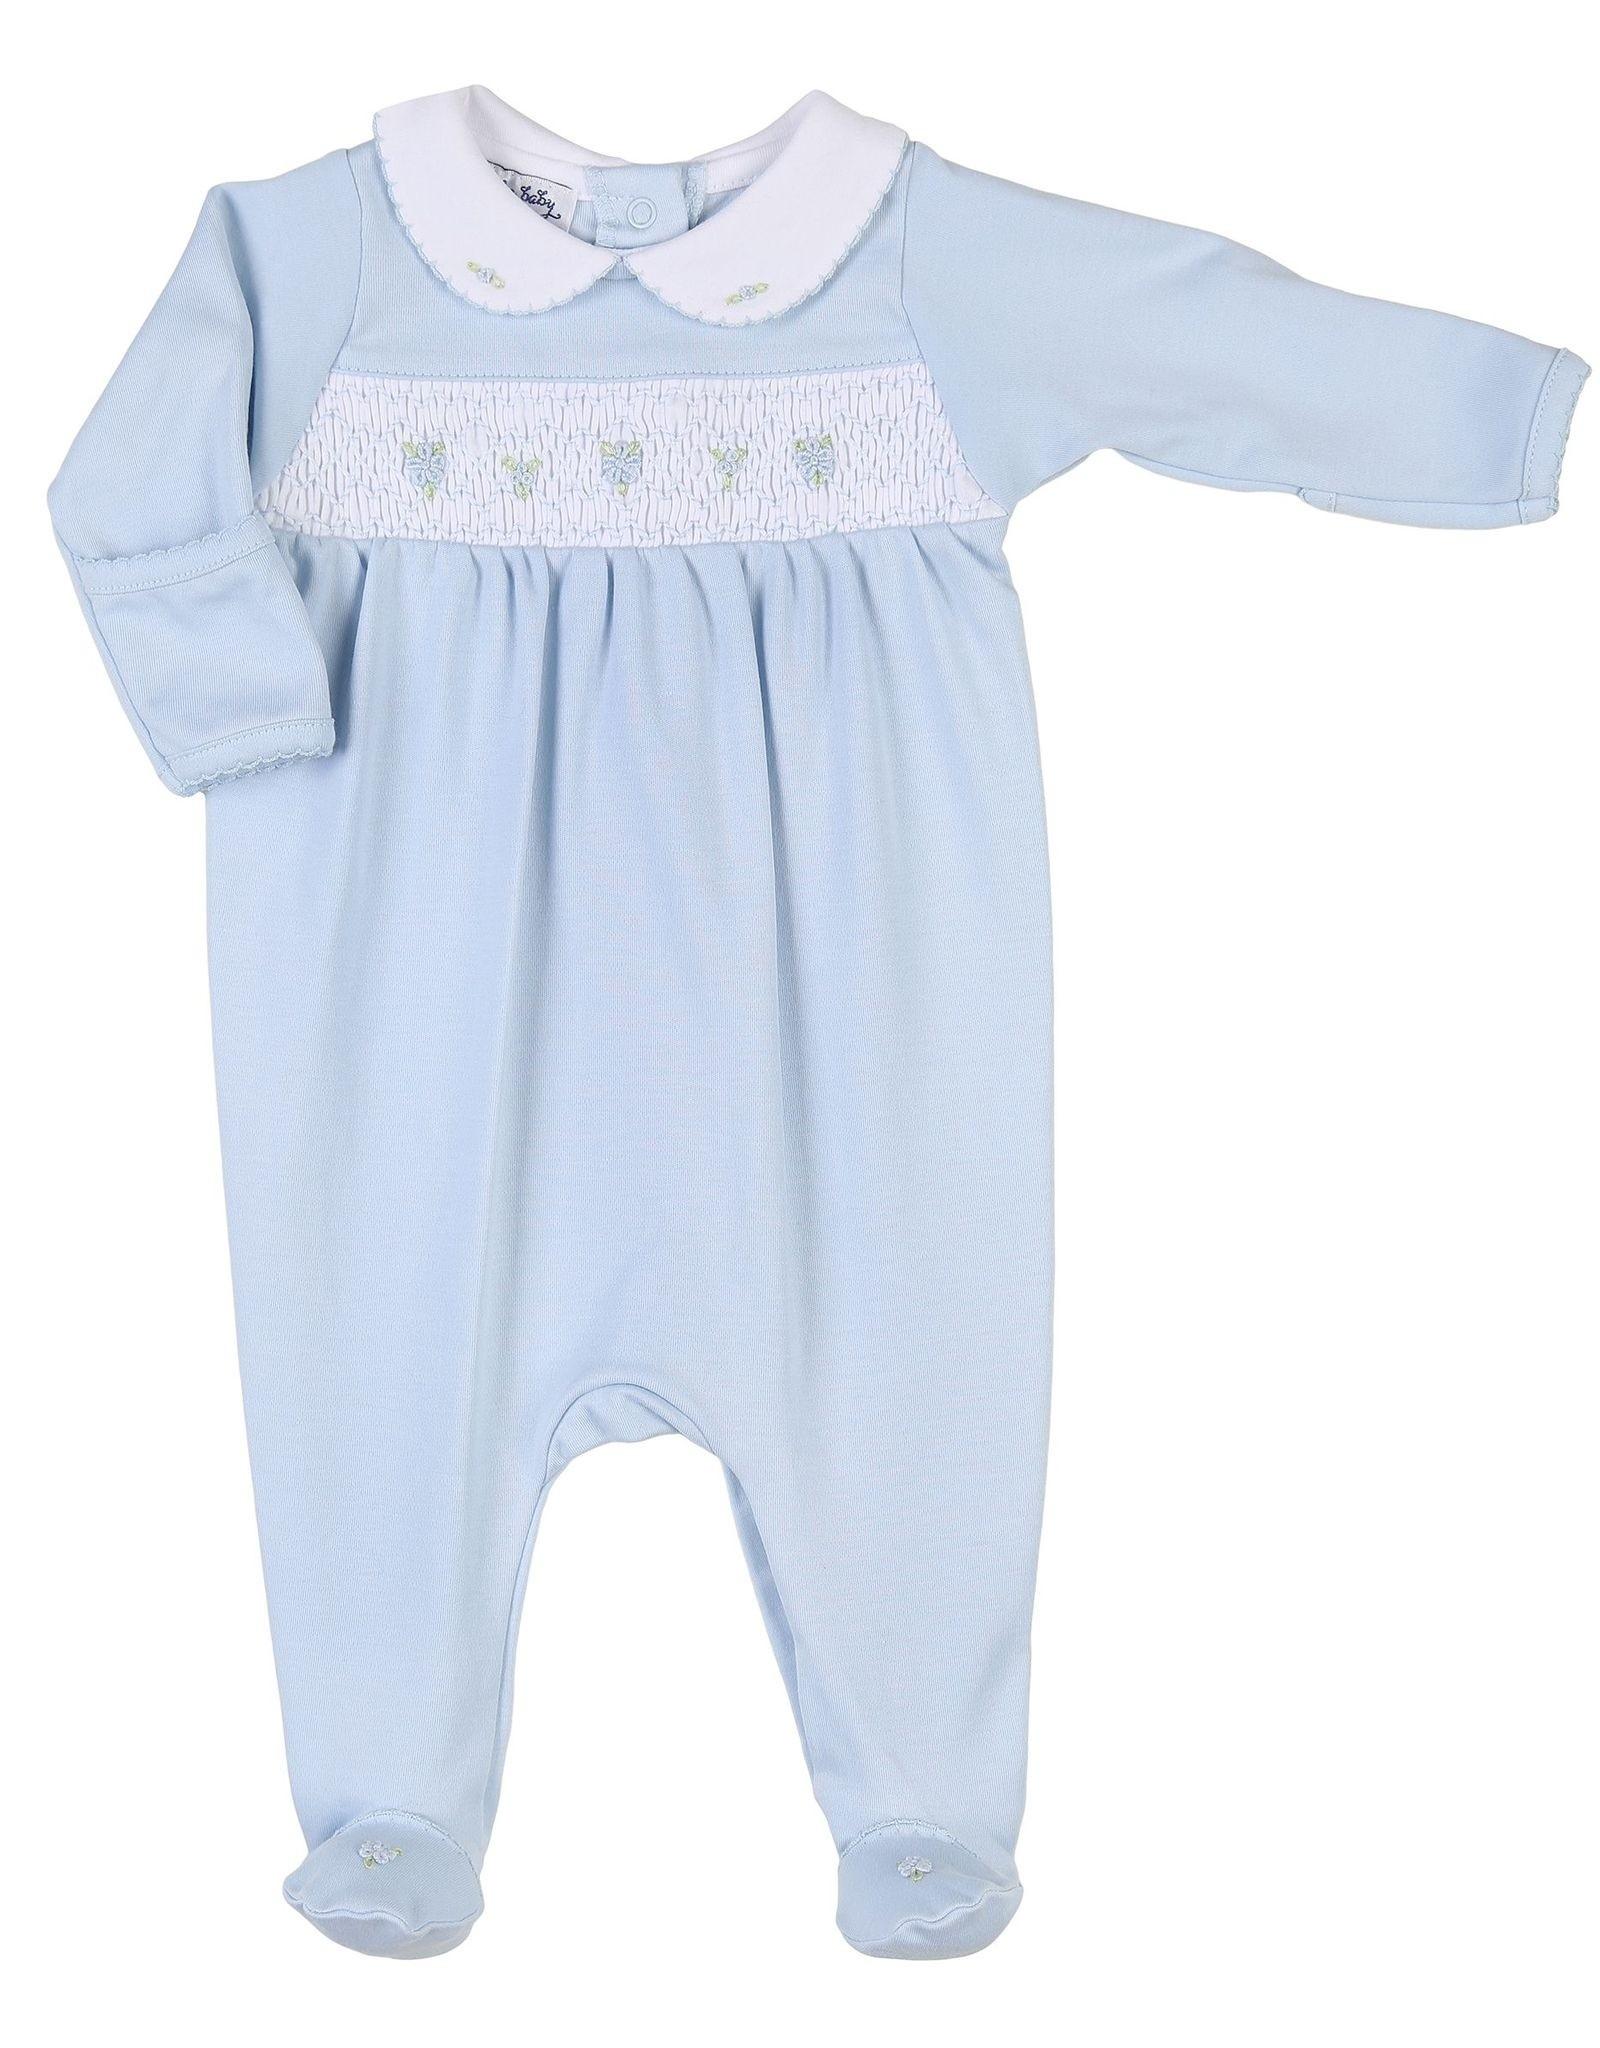 Magnolia Baby Elena & Elia's Smocked Collared Girls Footie - Blue